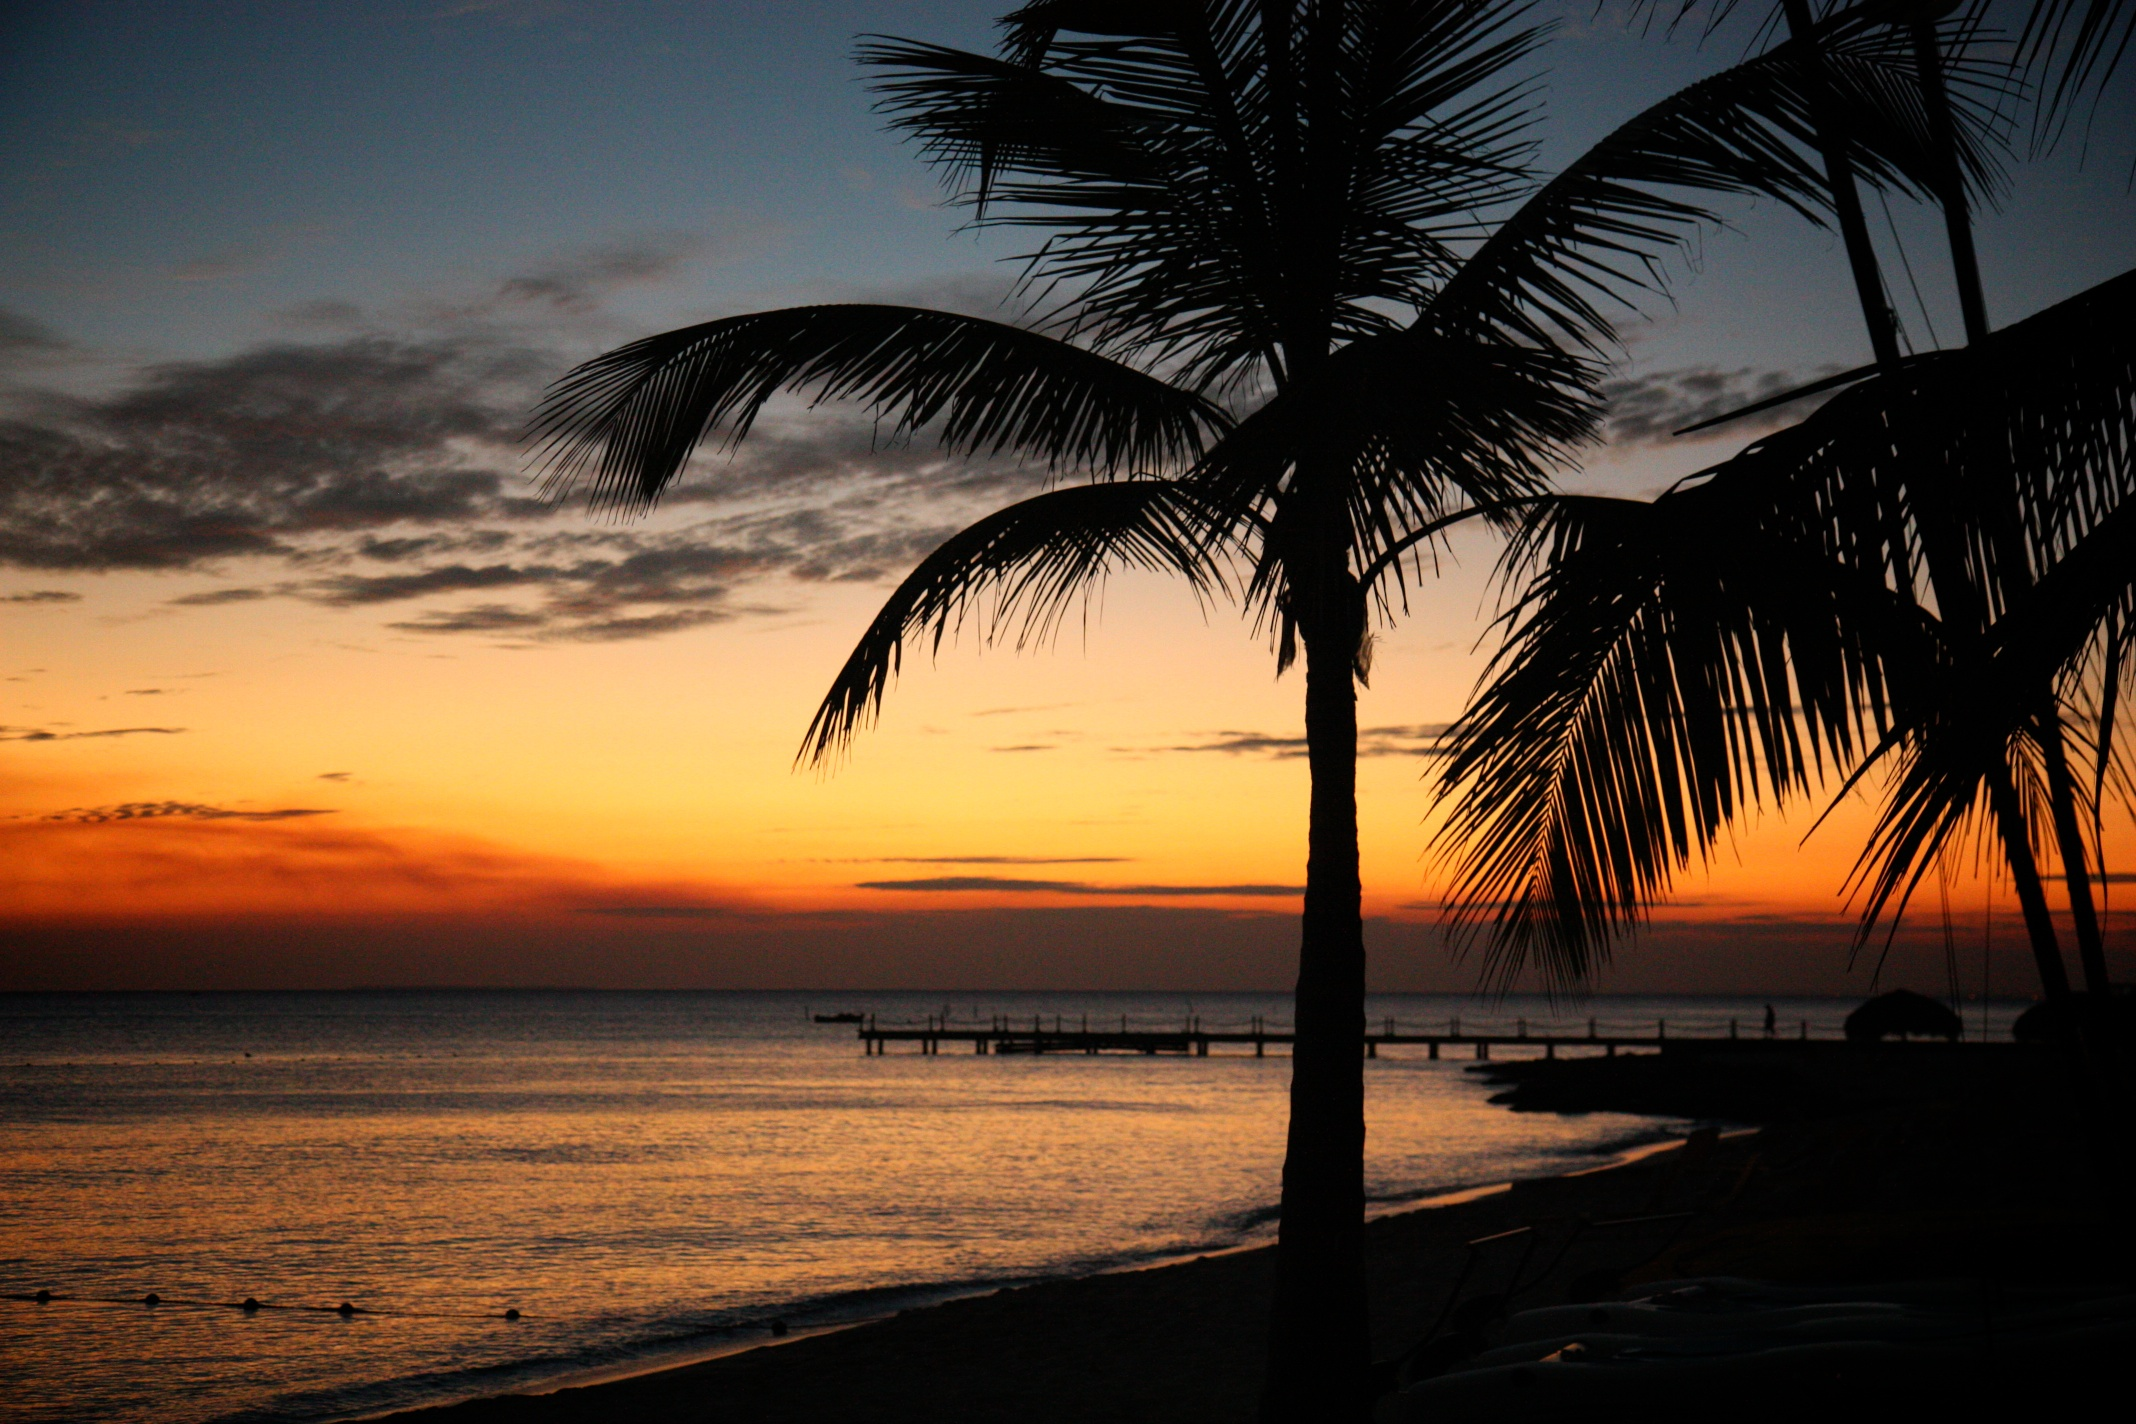 la-romana-sunset_8570921034_o.jpg